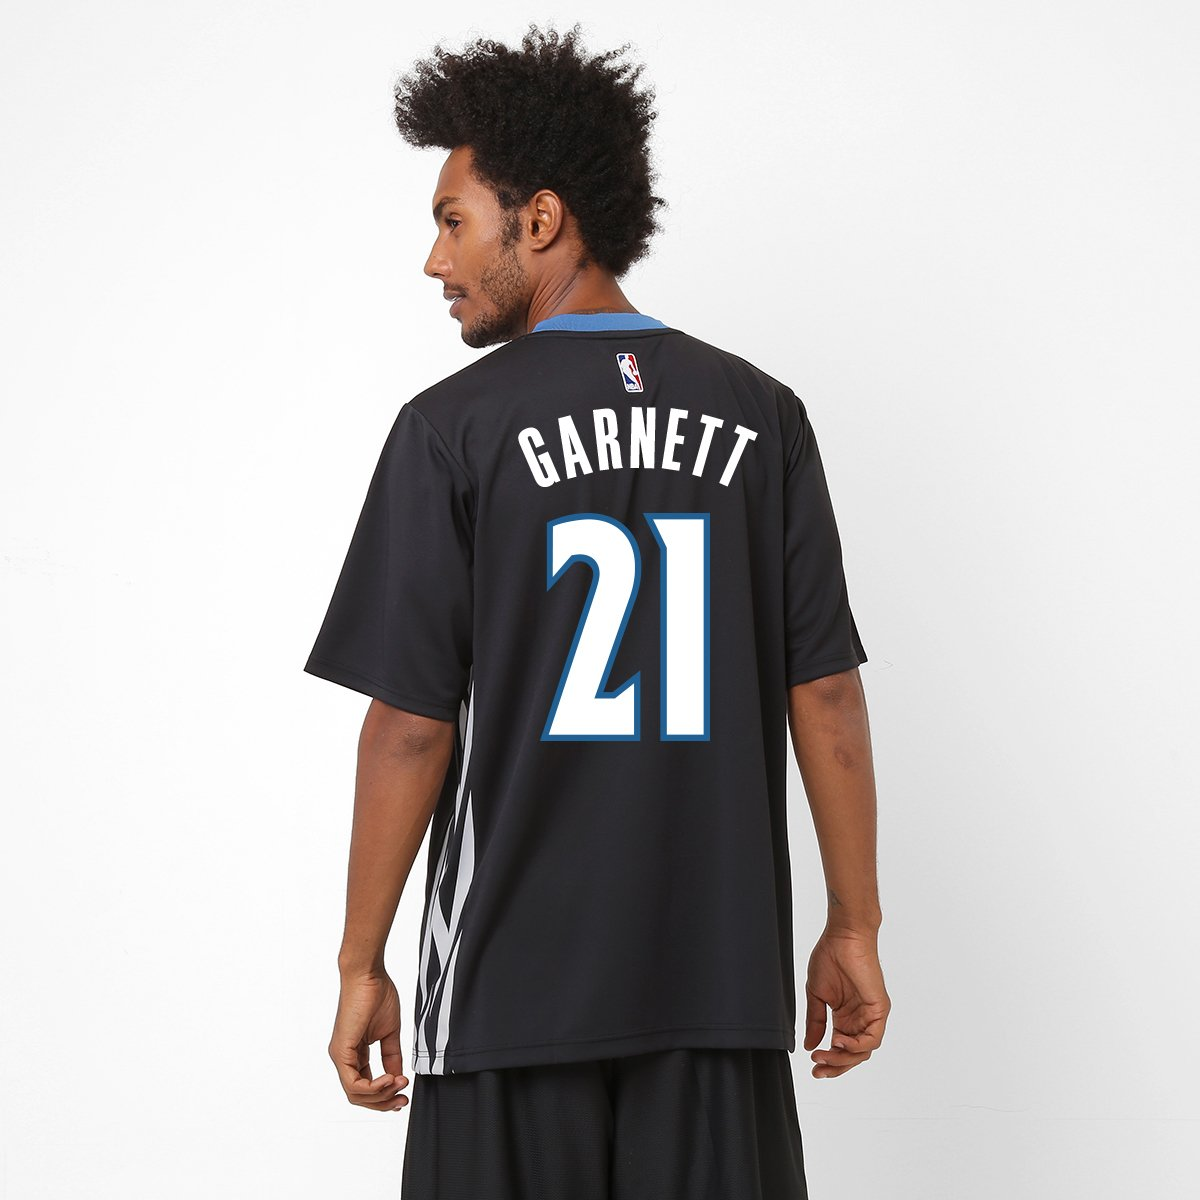 7655c9f76 Camiseta Regata NBA Adidas Minnesota Timberwolves - Garnett nº 21 - Compre  Agora